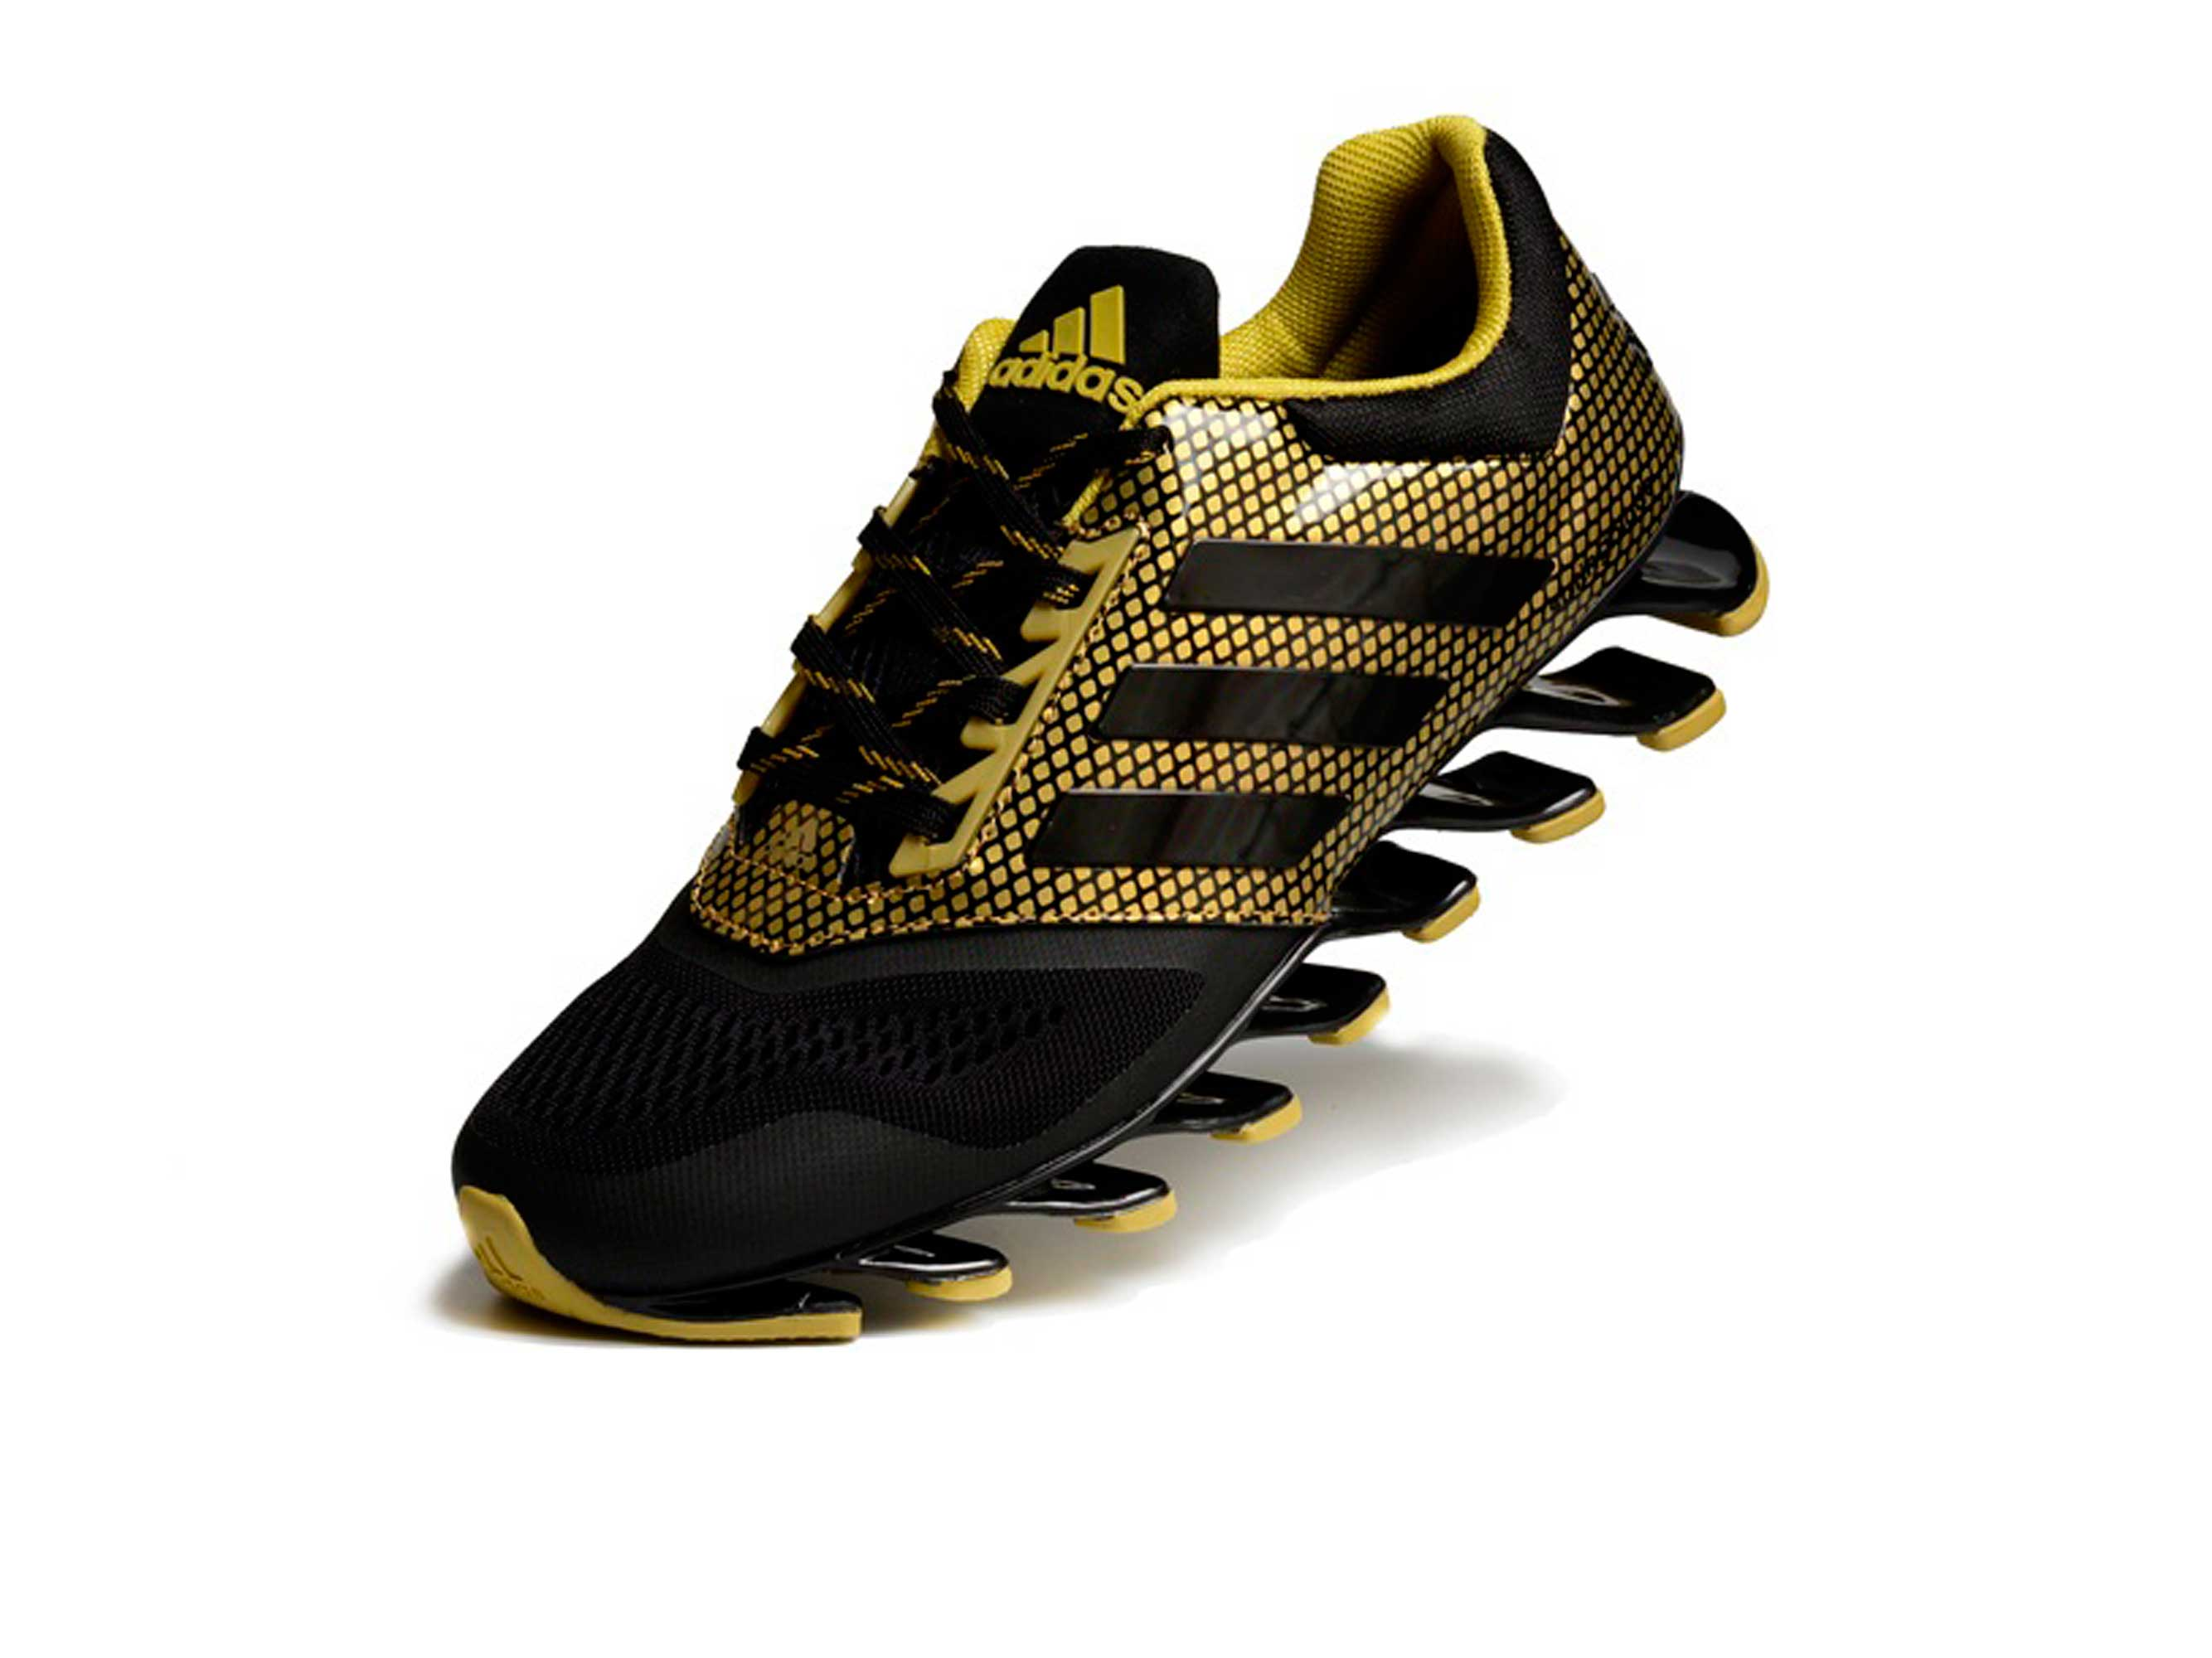 0e27fbde93a ... official adidas springblade drive 2.0 navy black gold 96f0f ec69f